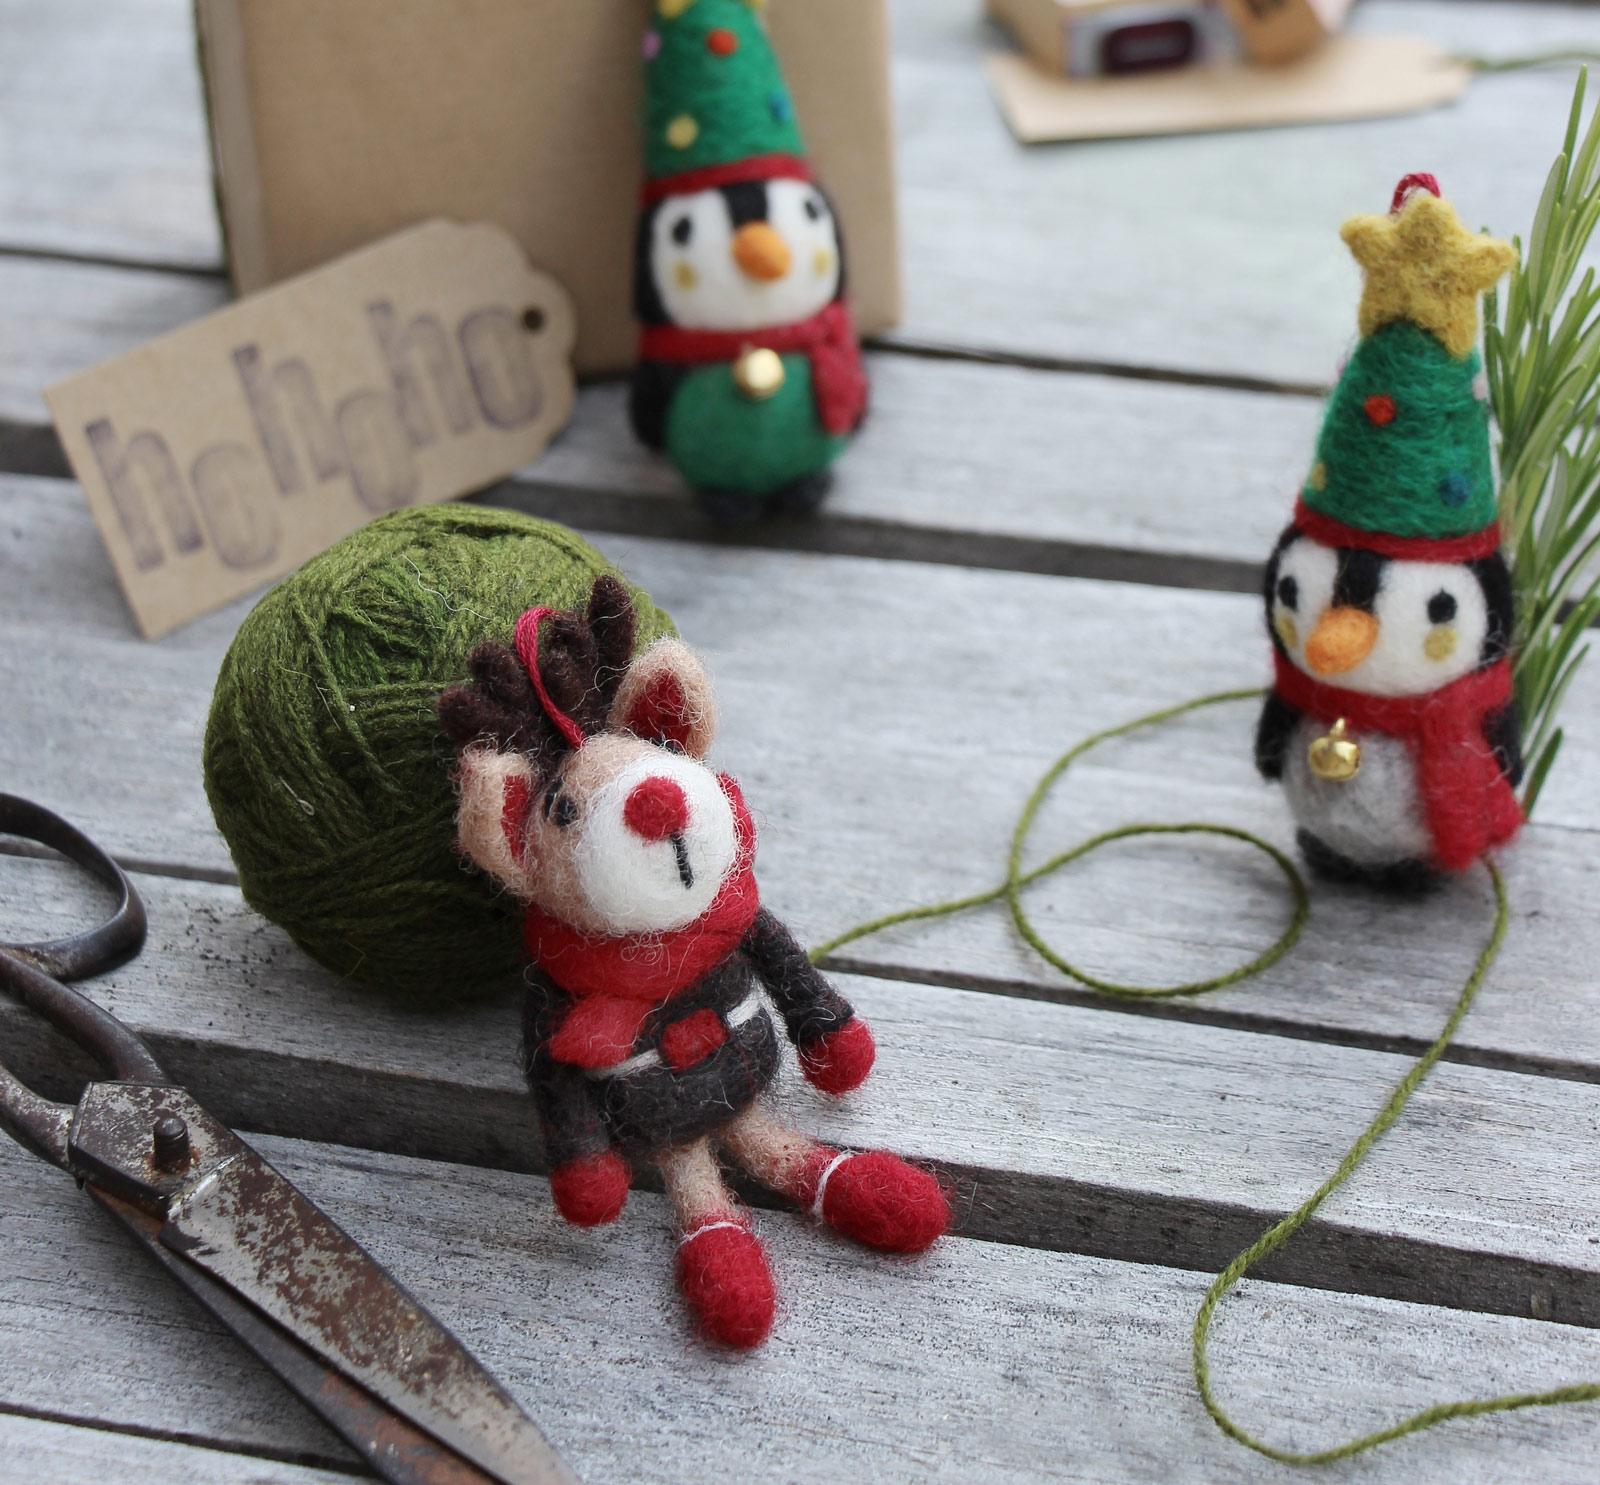 10% Rabatt & gratis Kalender bei GLOBO Fair Trade | Winterdeko, Weihnachtsgeschenke, Home & Living